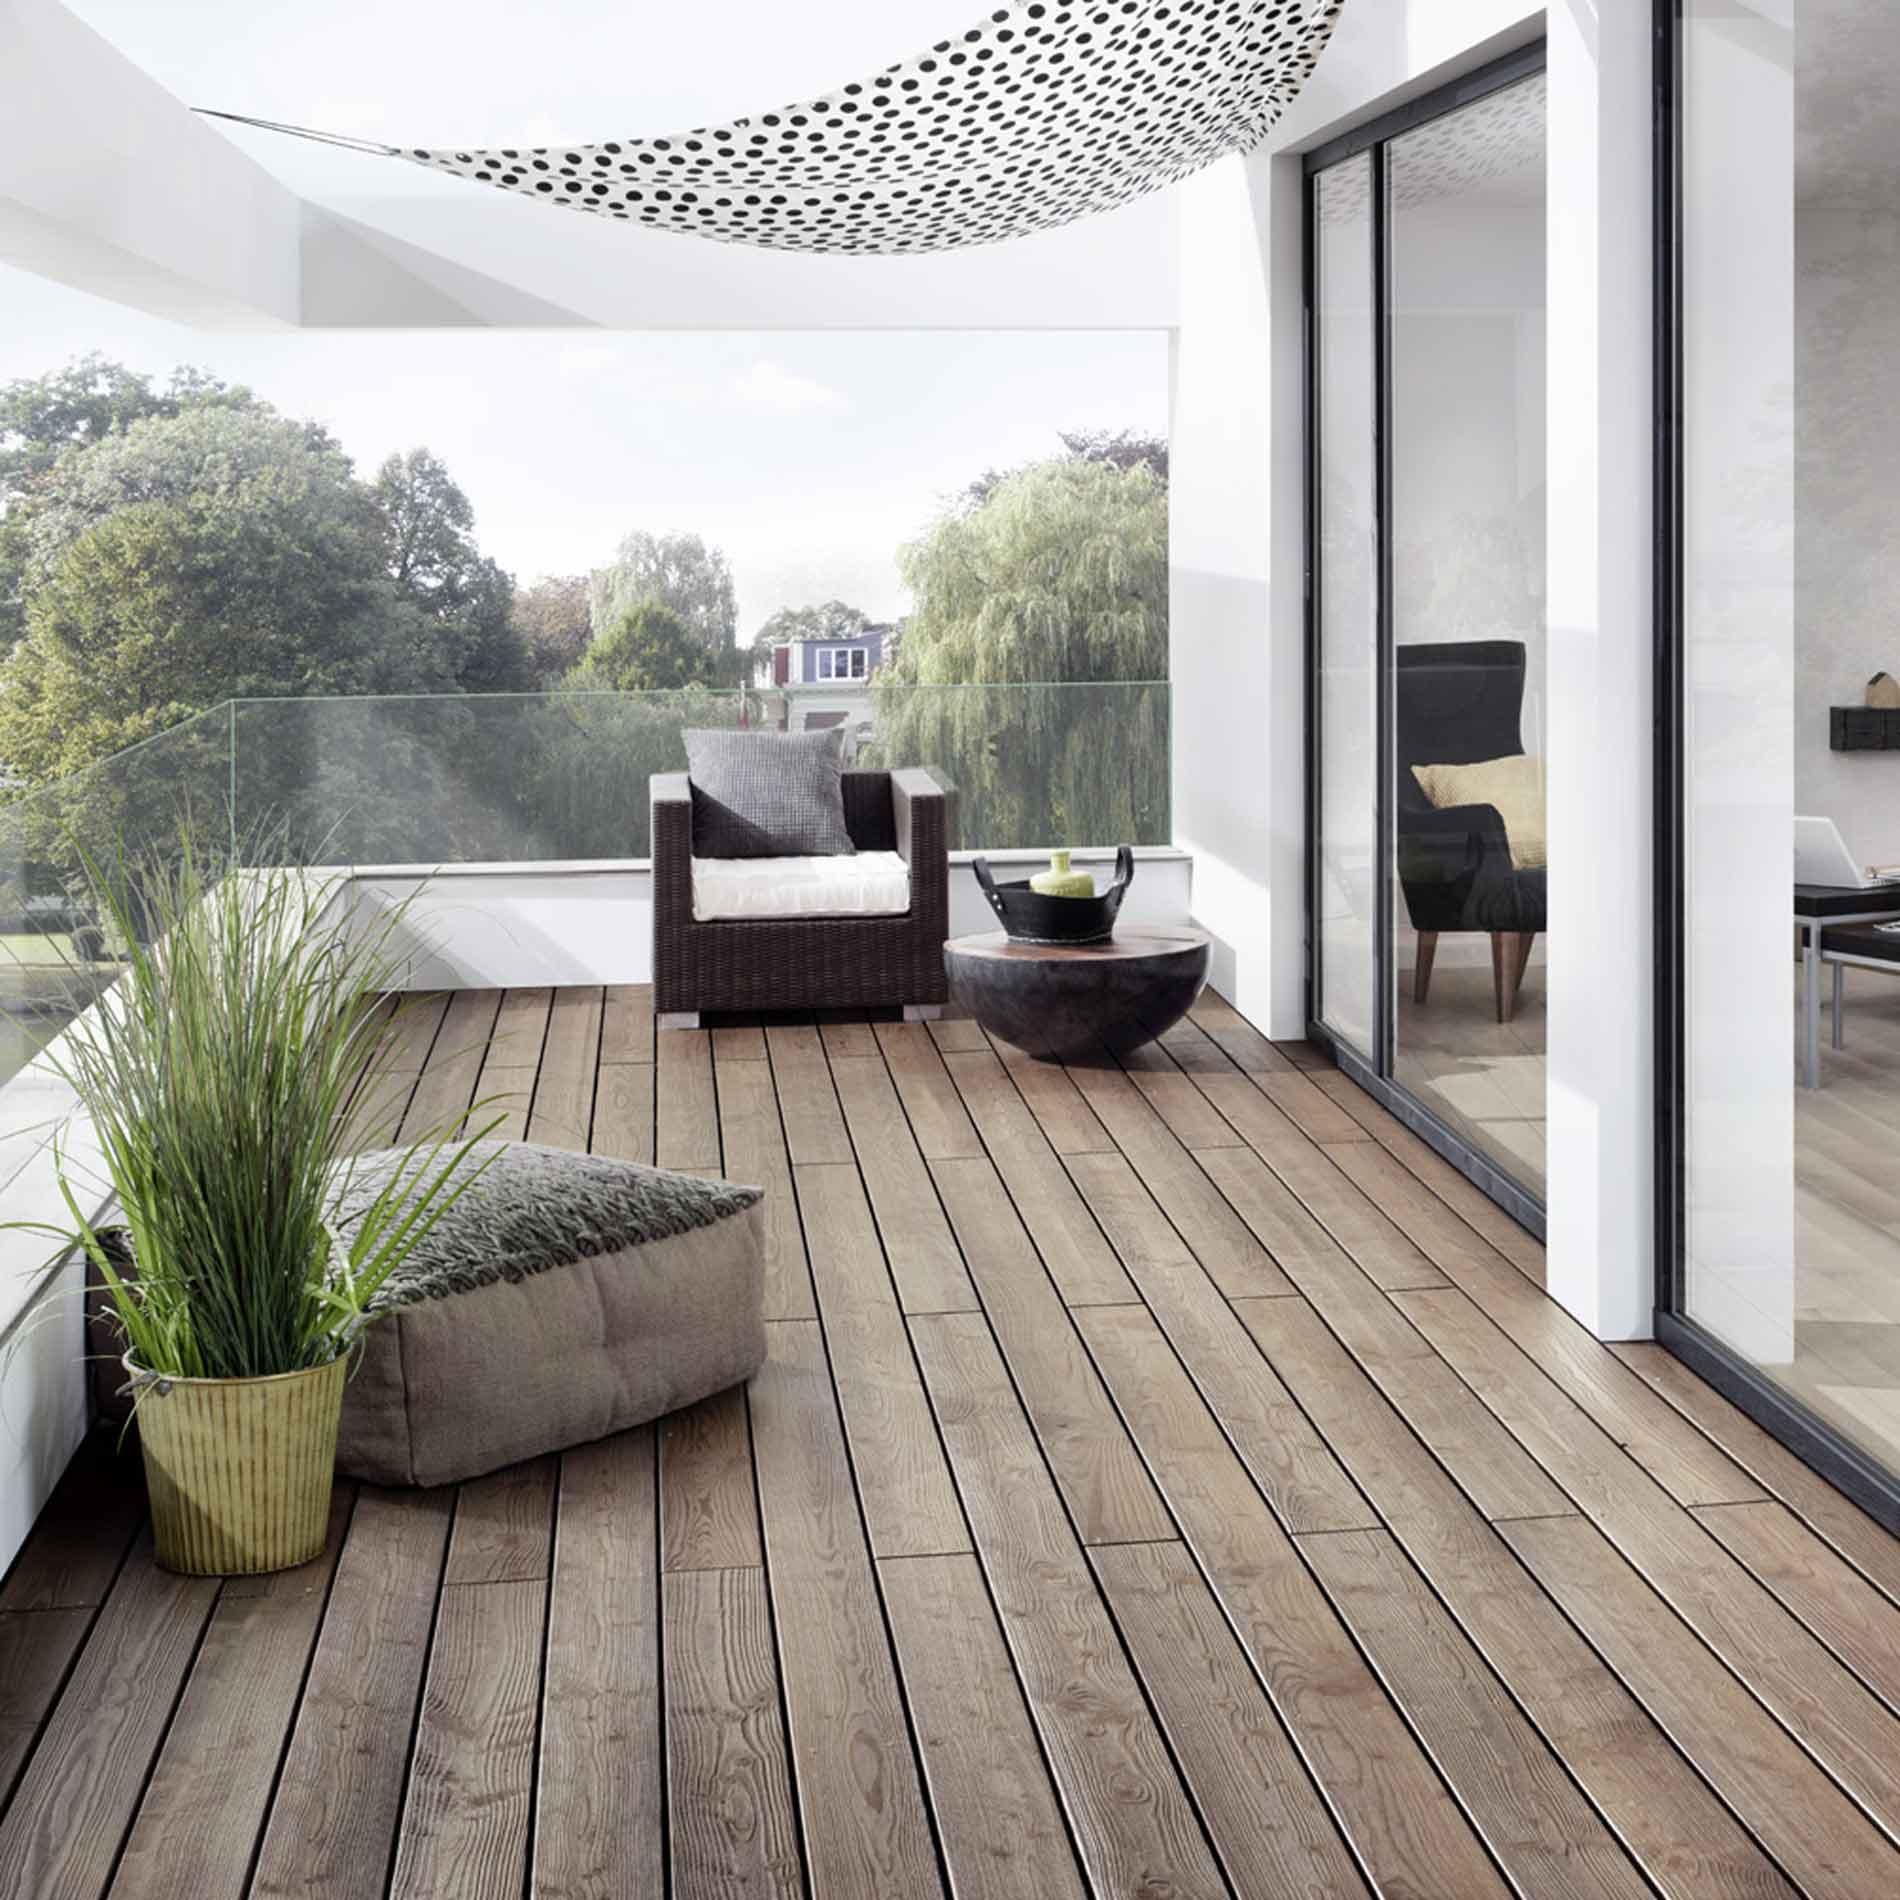 Terrassendielen aus Holz – Urban Style HolzLand Verbeek